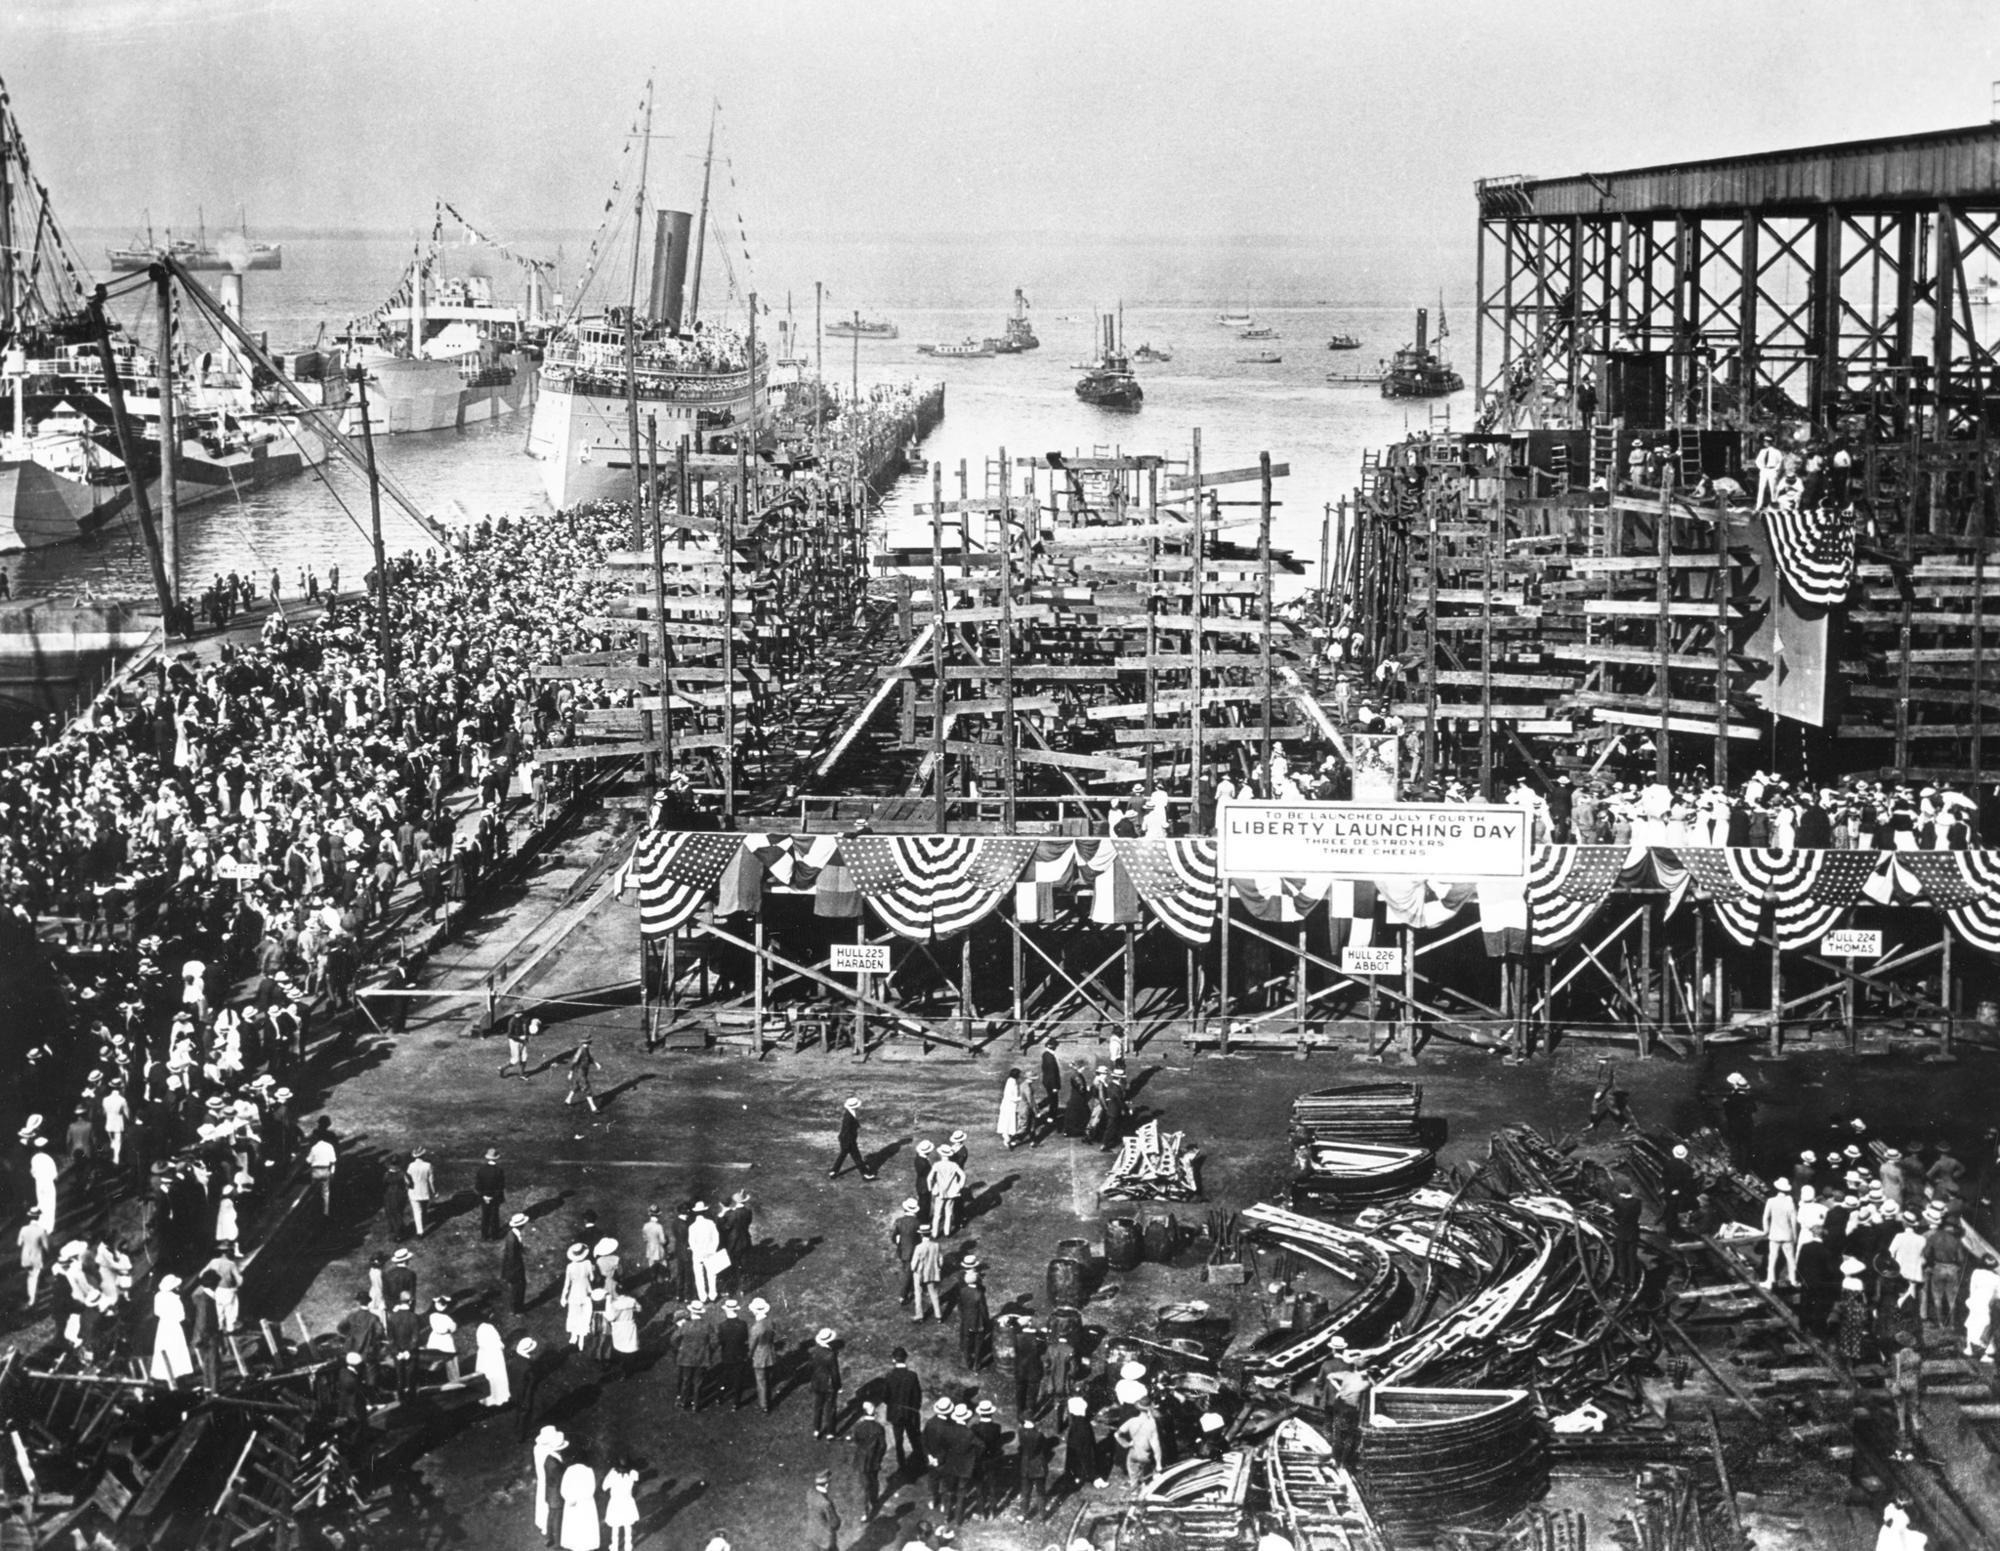 Newport News shipyard's WWI destroyer boom driven by U-boat fears